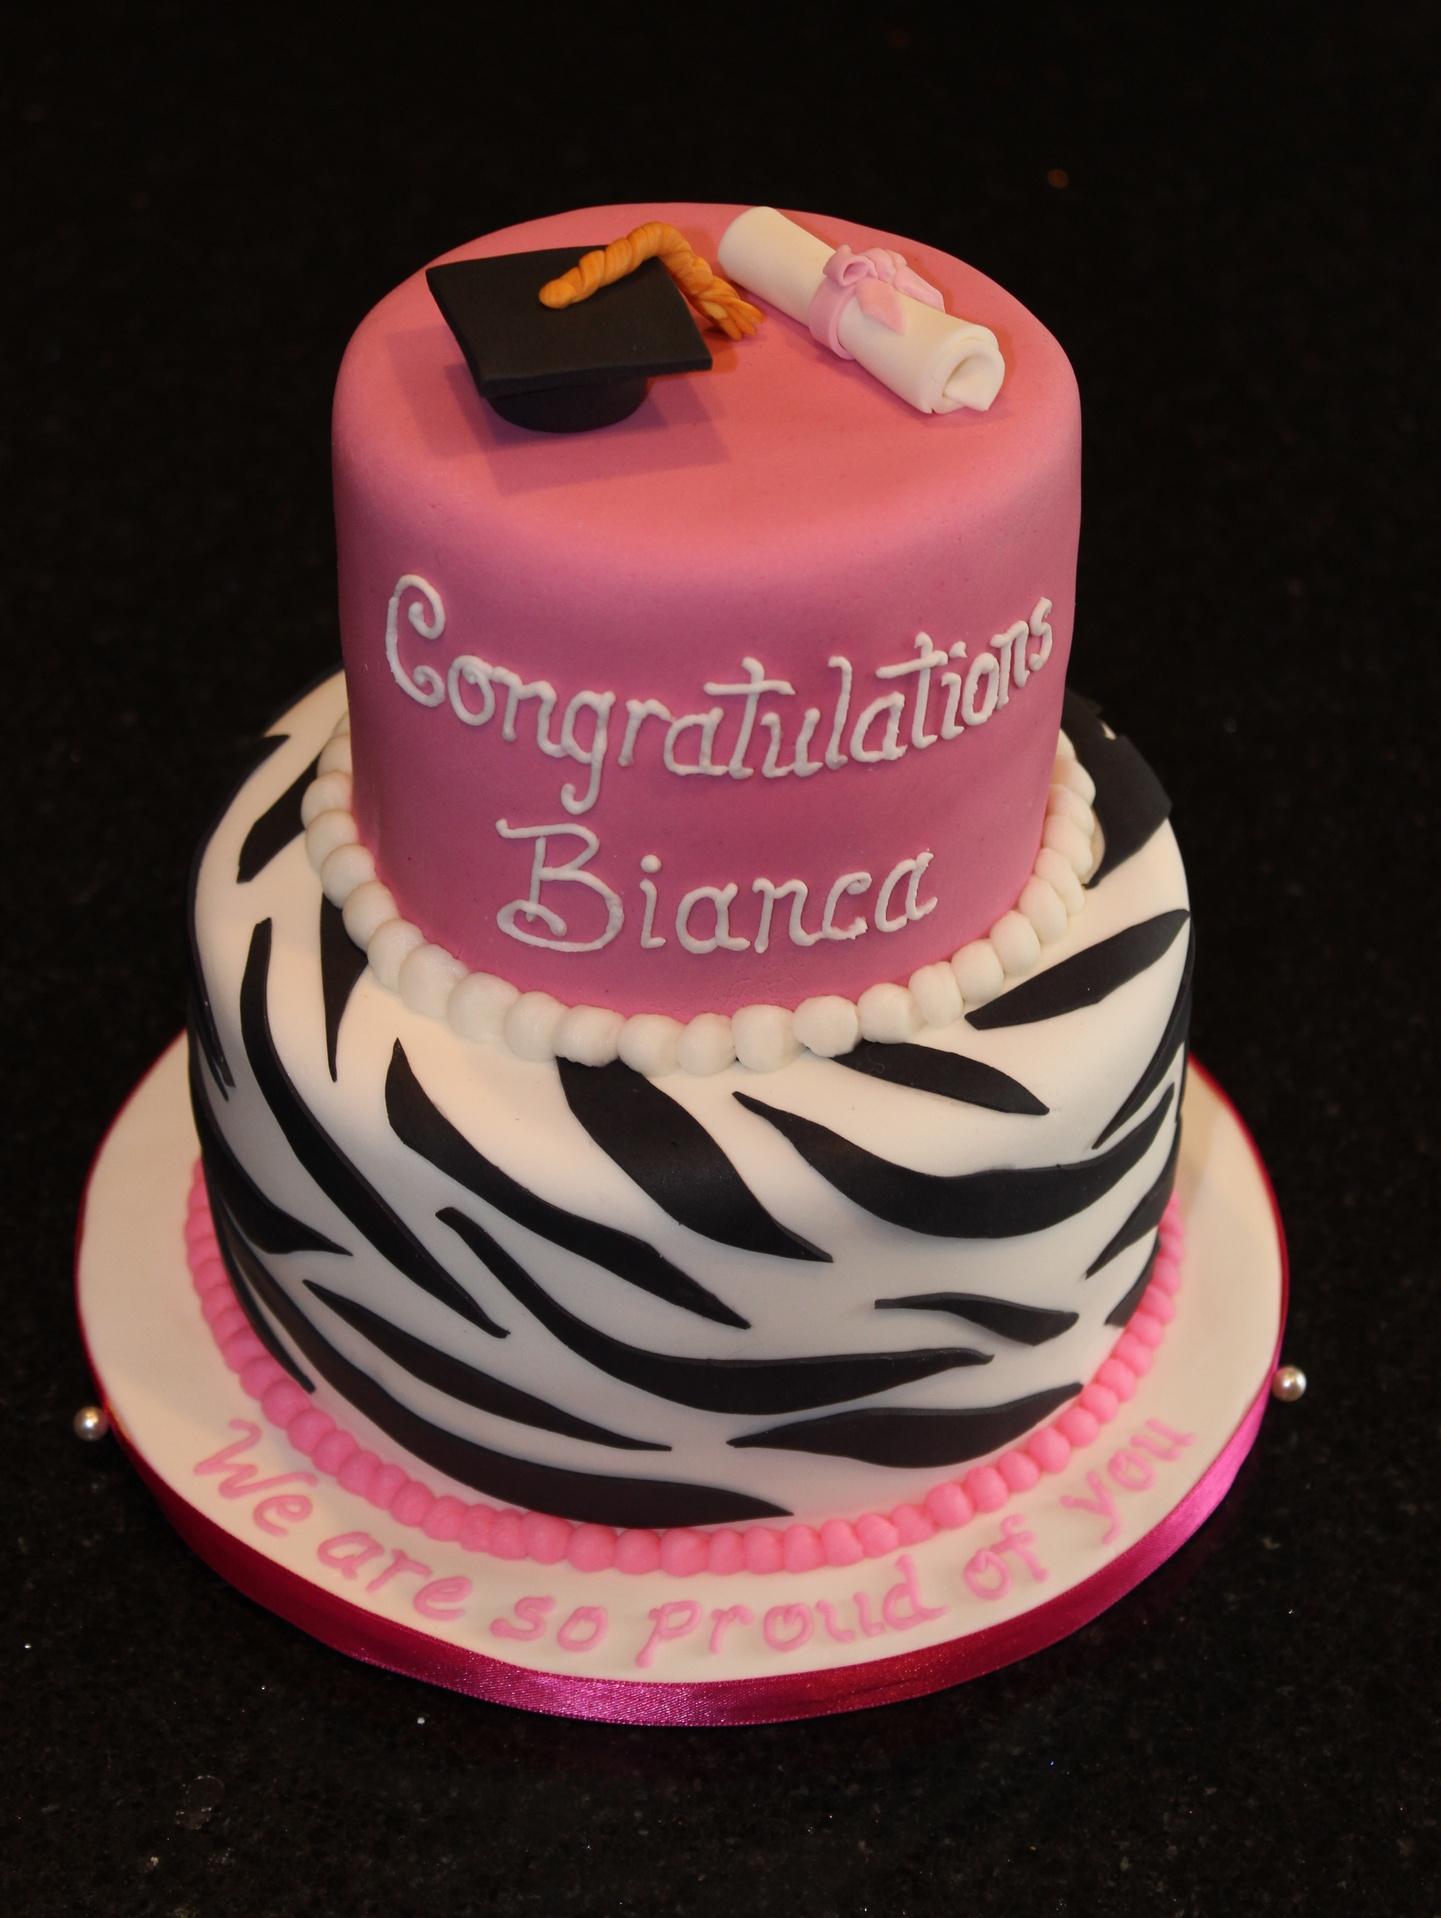 2 Tiered Graduation Cake